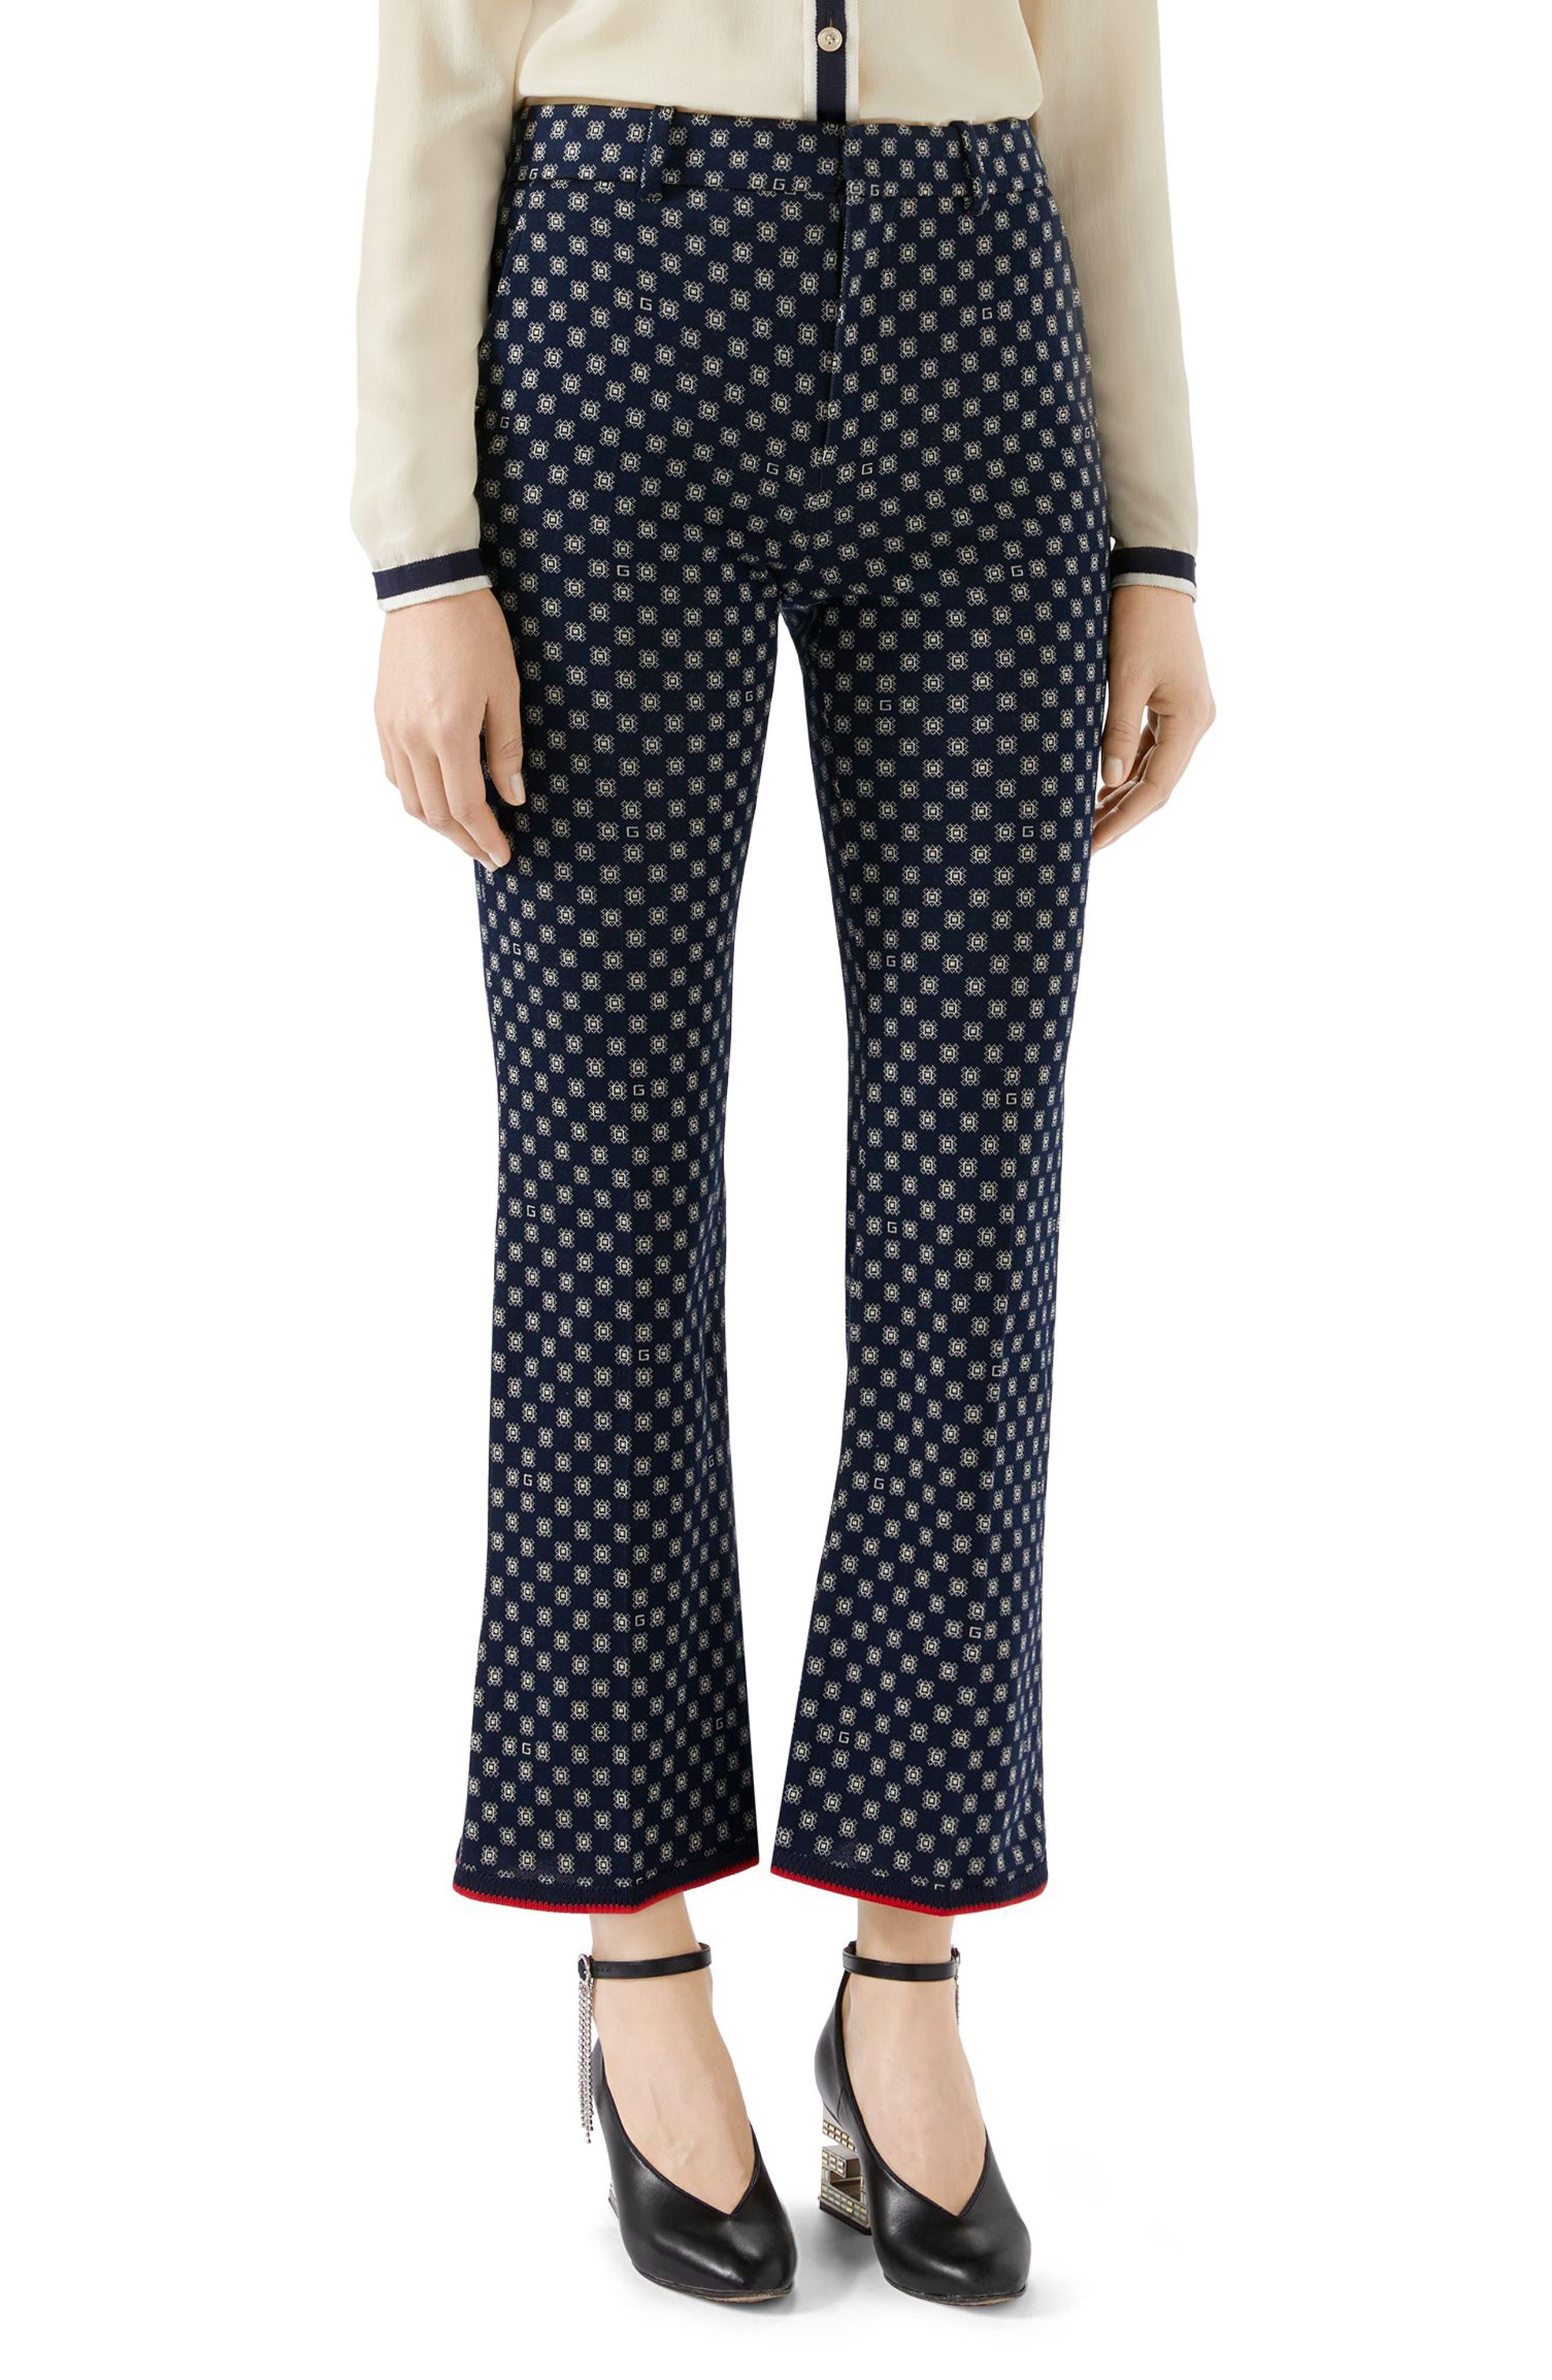 GUCCI,                             G-Frames Jersey Bootcut Pants,                             Main thumbnail 1, color,                             4819 CASPIAN/ BEIGE/ MC